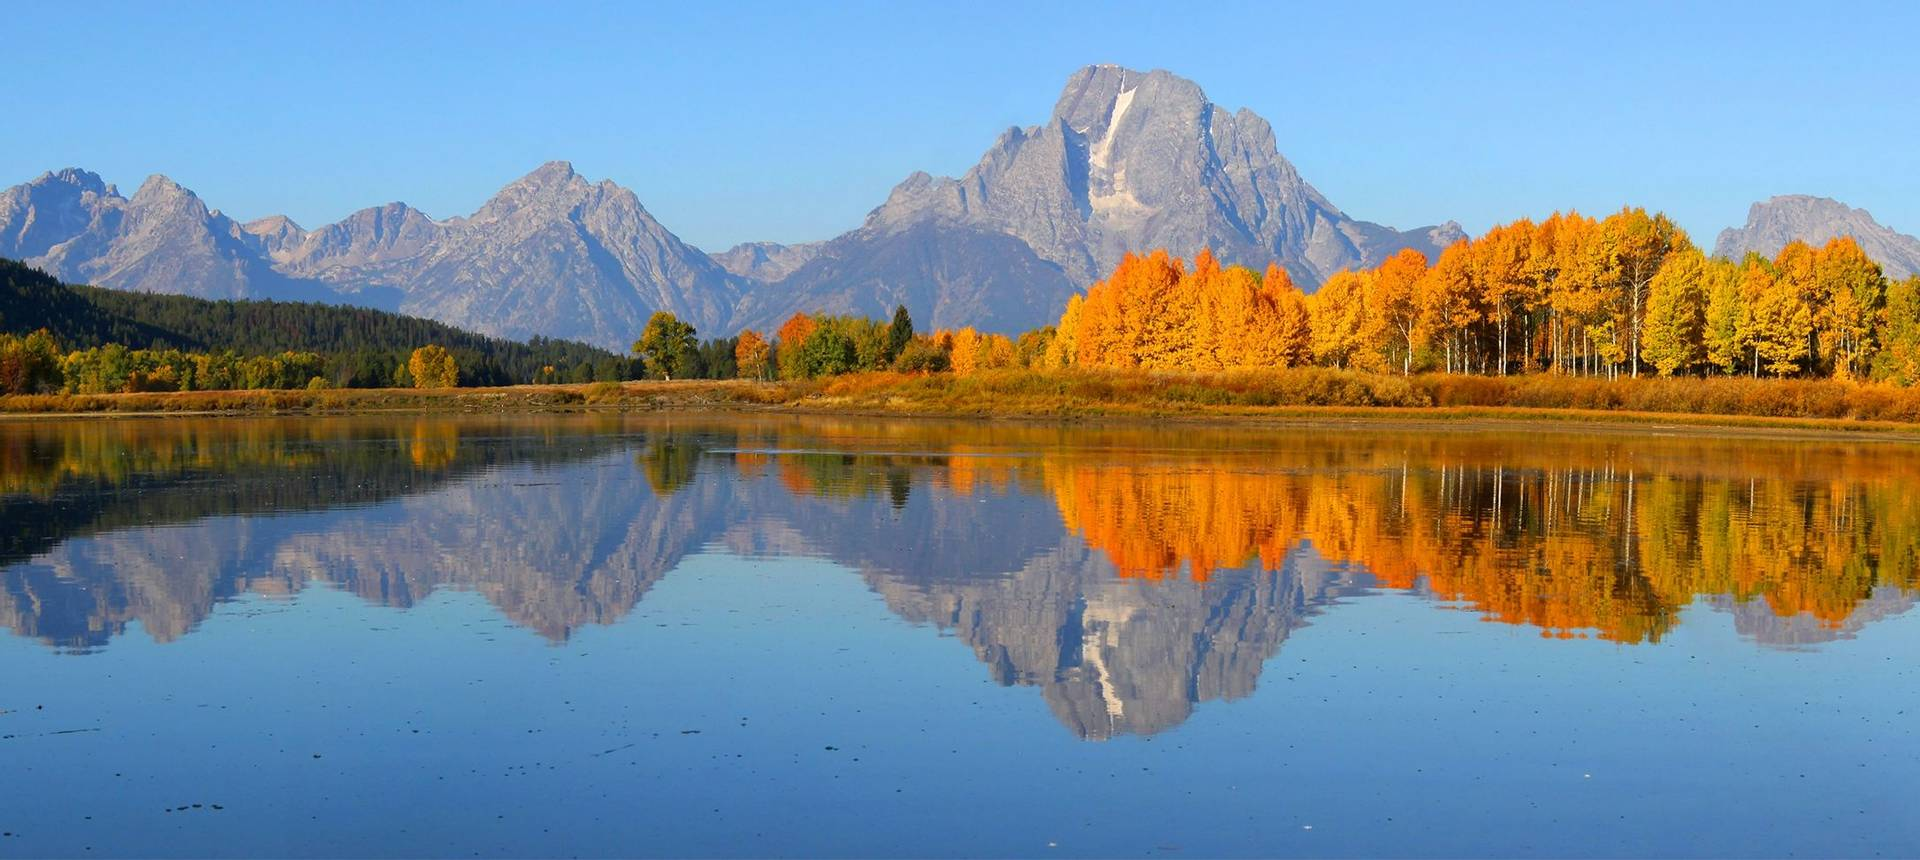 Grand Tetons National Park Shutterstock 63999946